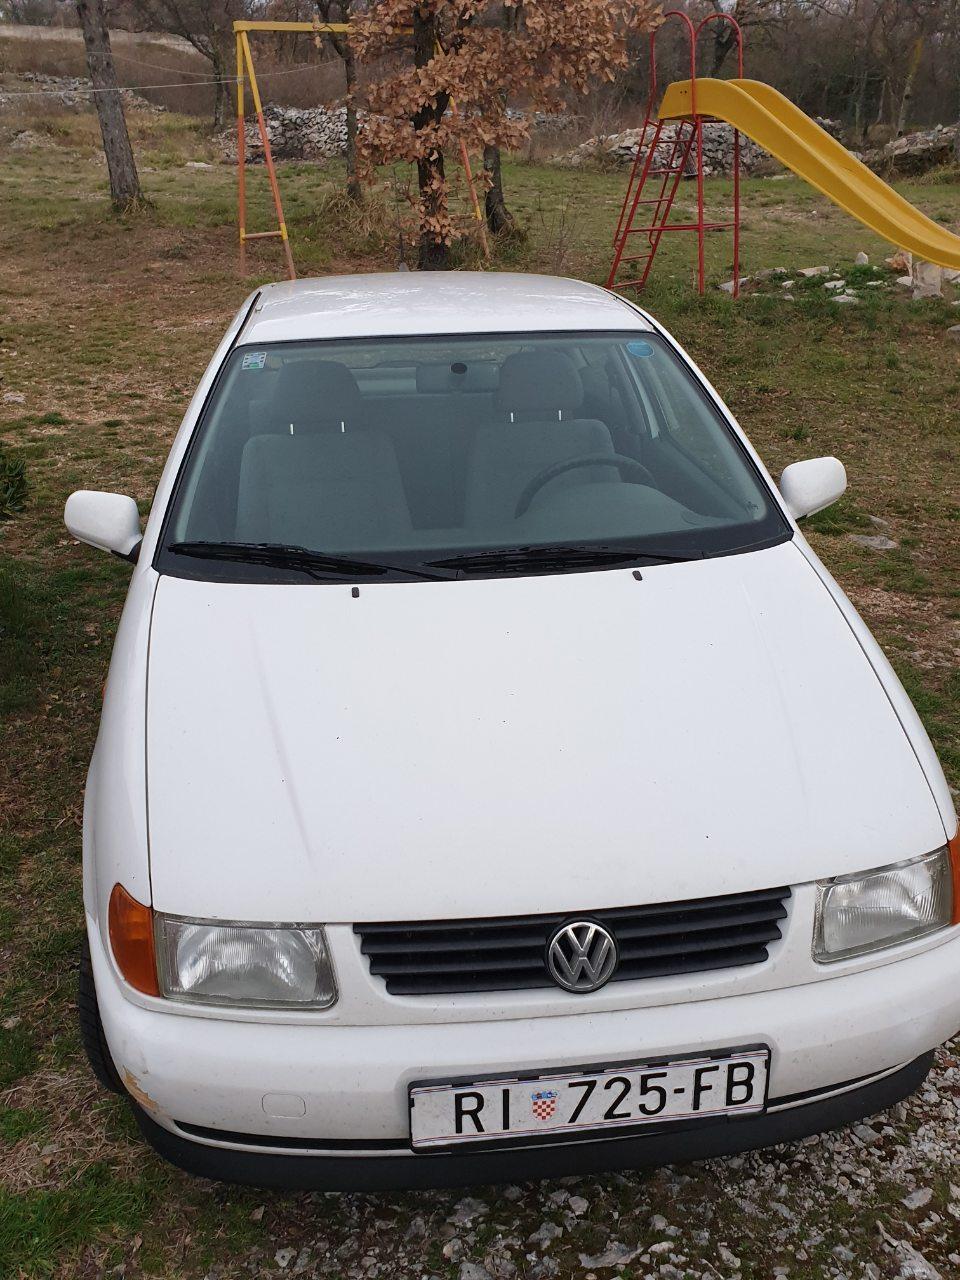 VW Polo 1.4 benz., 1996. god, 133.000 km